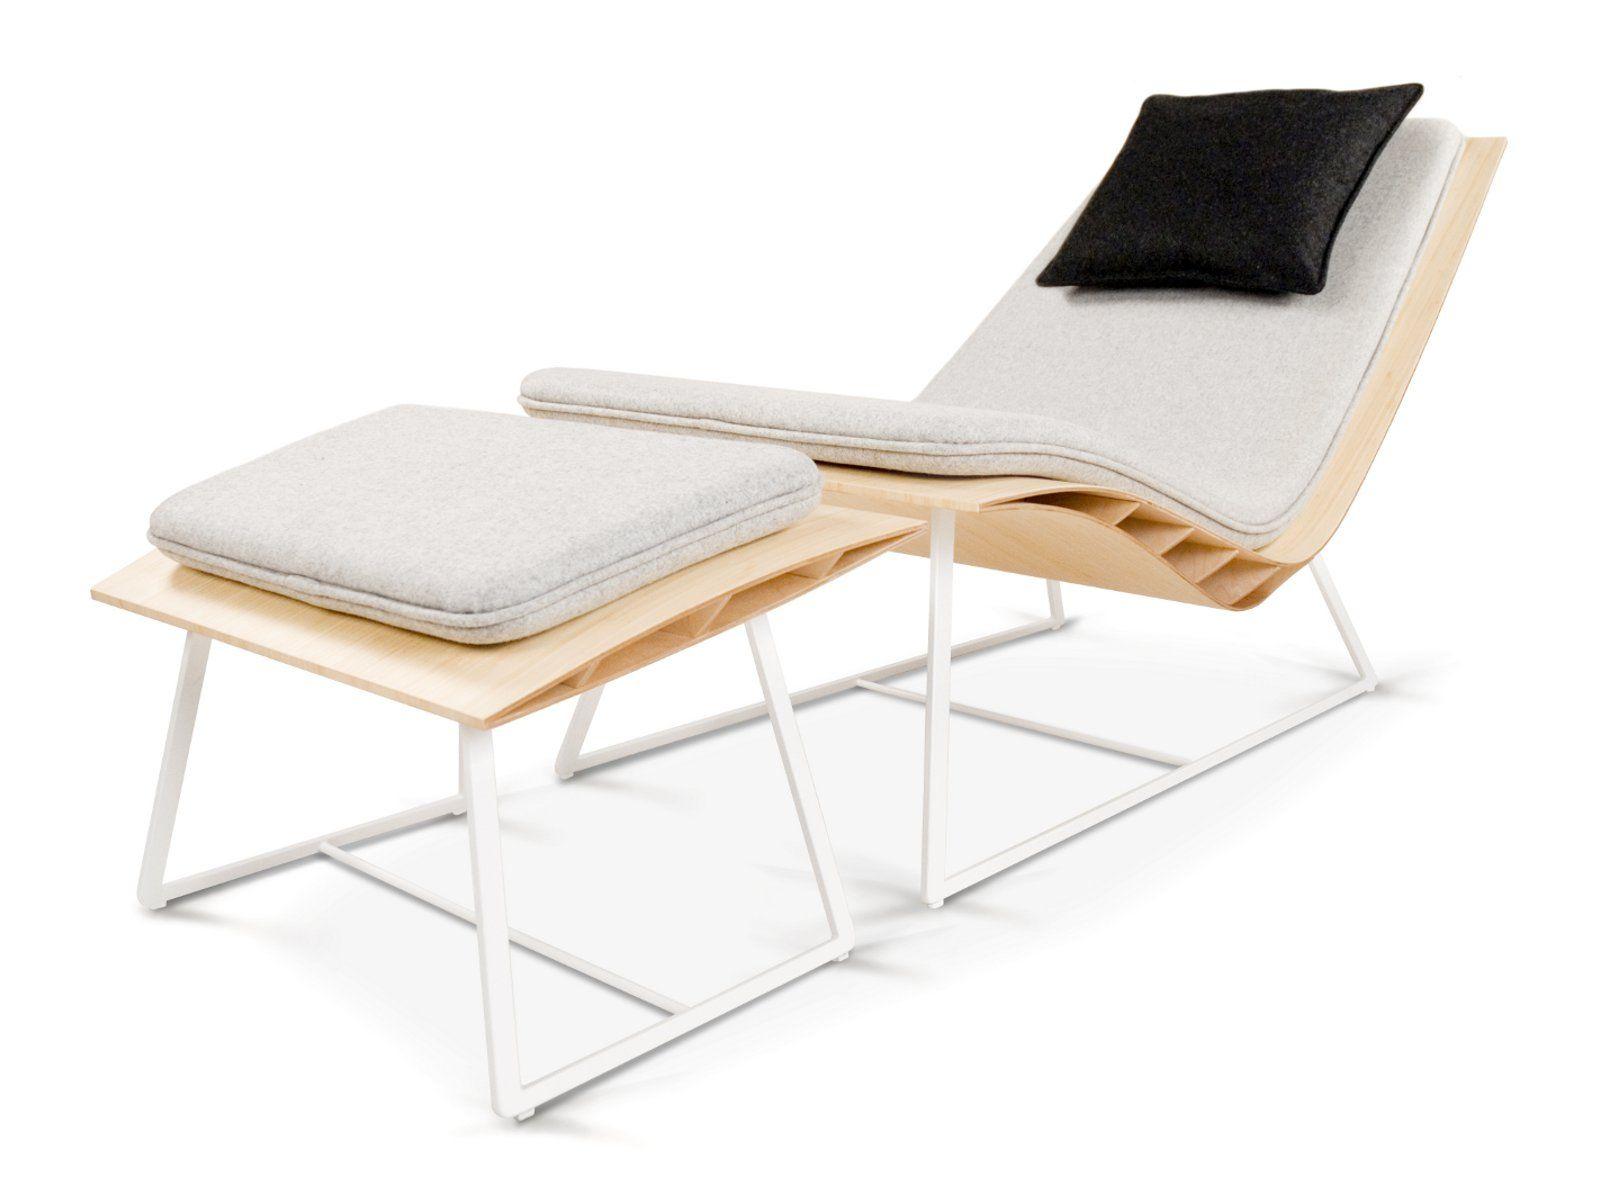 bee fauteuil avec repose pieds by la maison turrini design. Black Bedroom Furniture Sets. Home Design Ideas